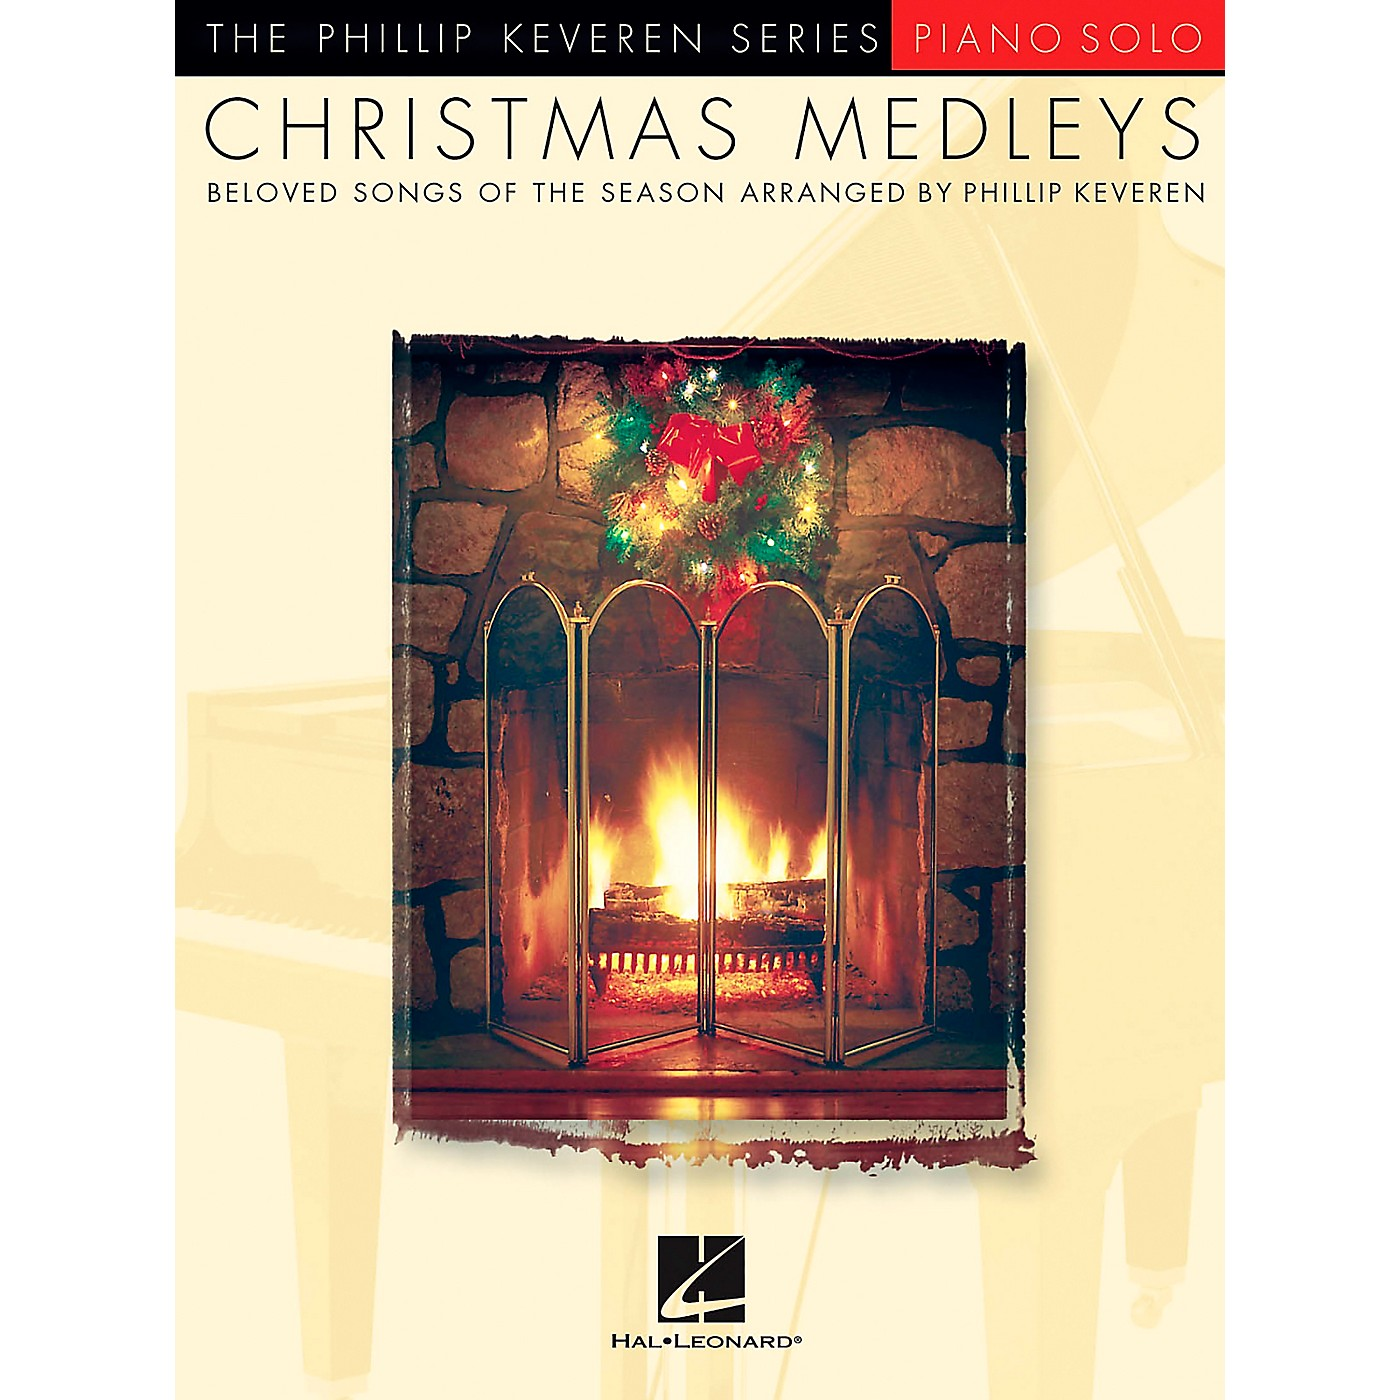 Hal Leonard Christmas Medleys - Piano Solo By Phillip Keveren Series thumbnail